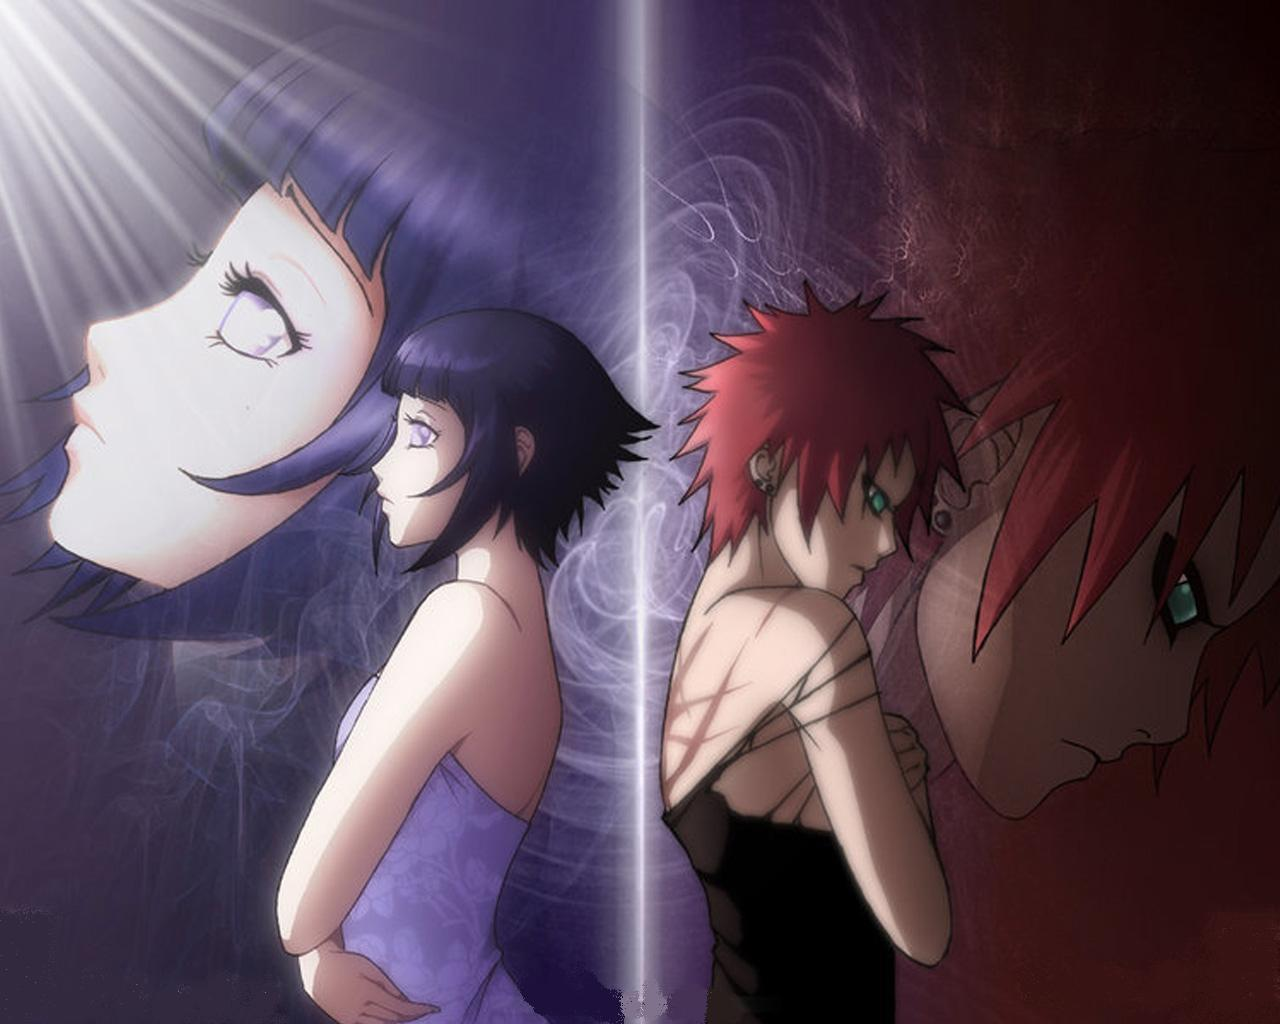 Naruto And Bleach Anime Wallpapers Hinata Hyuga 1280x1024